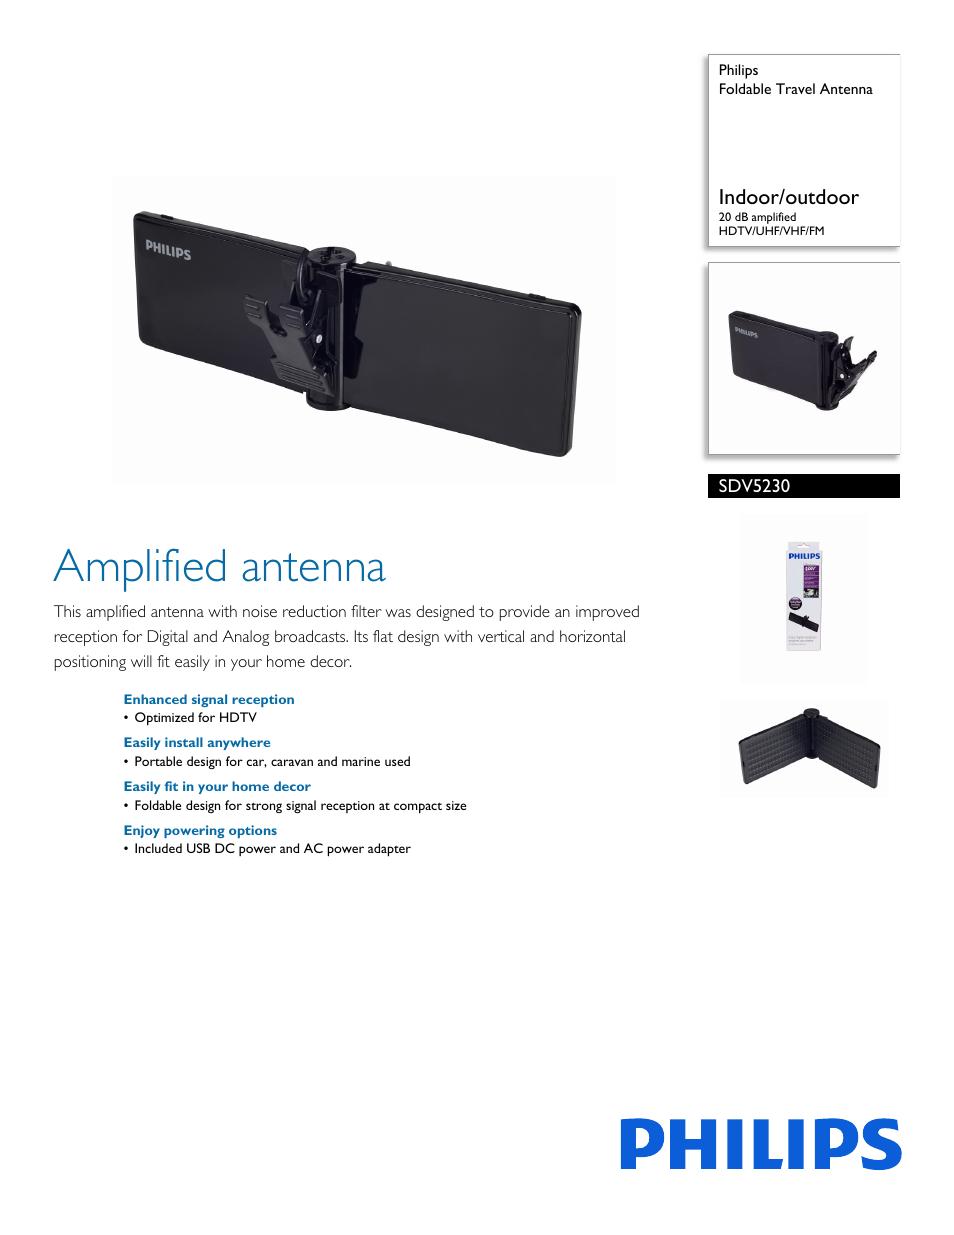 philips sdv5230 27 user manual 2 pages rh manualsdir com philips hdtv antenna mant940 manual Best HD Antenna